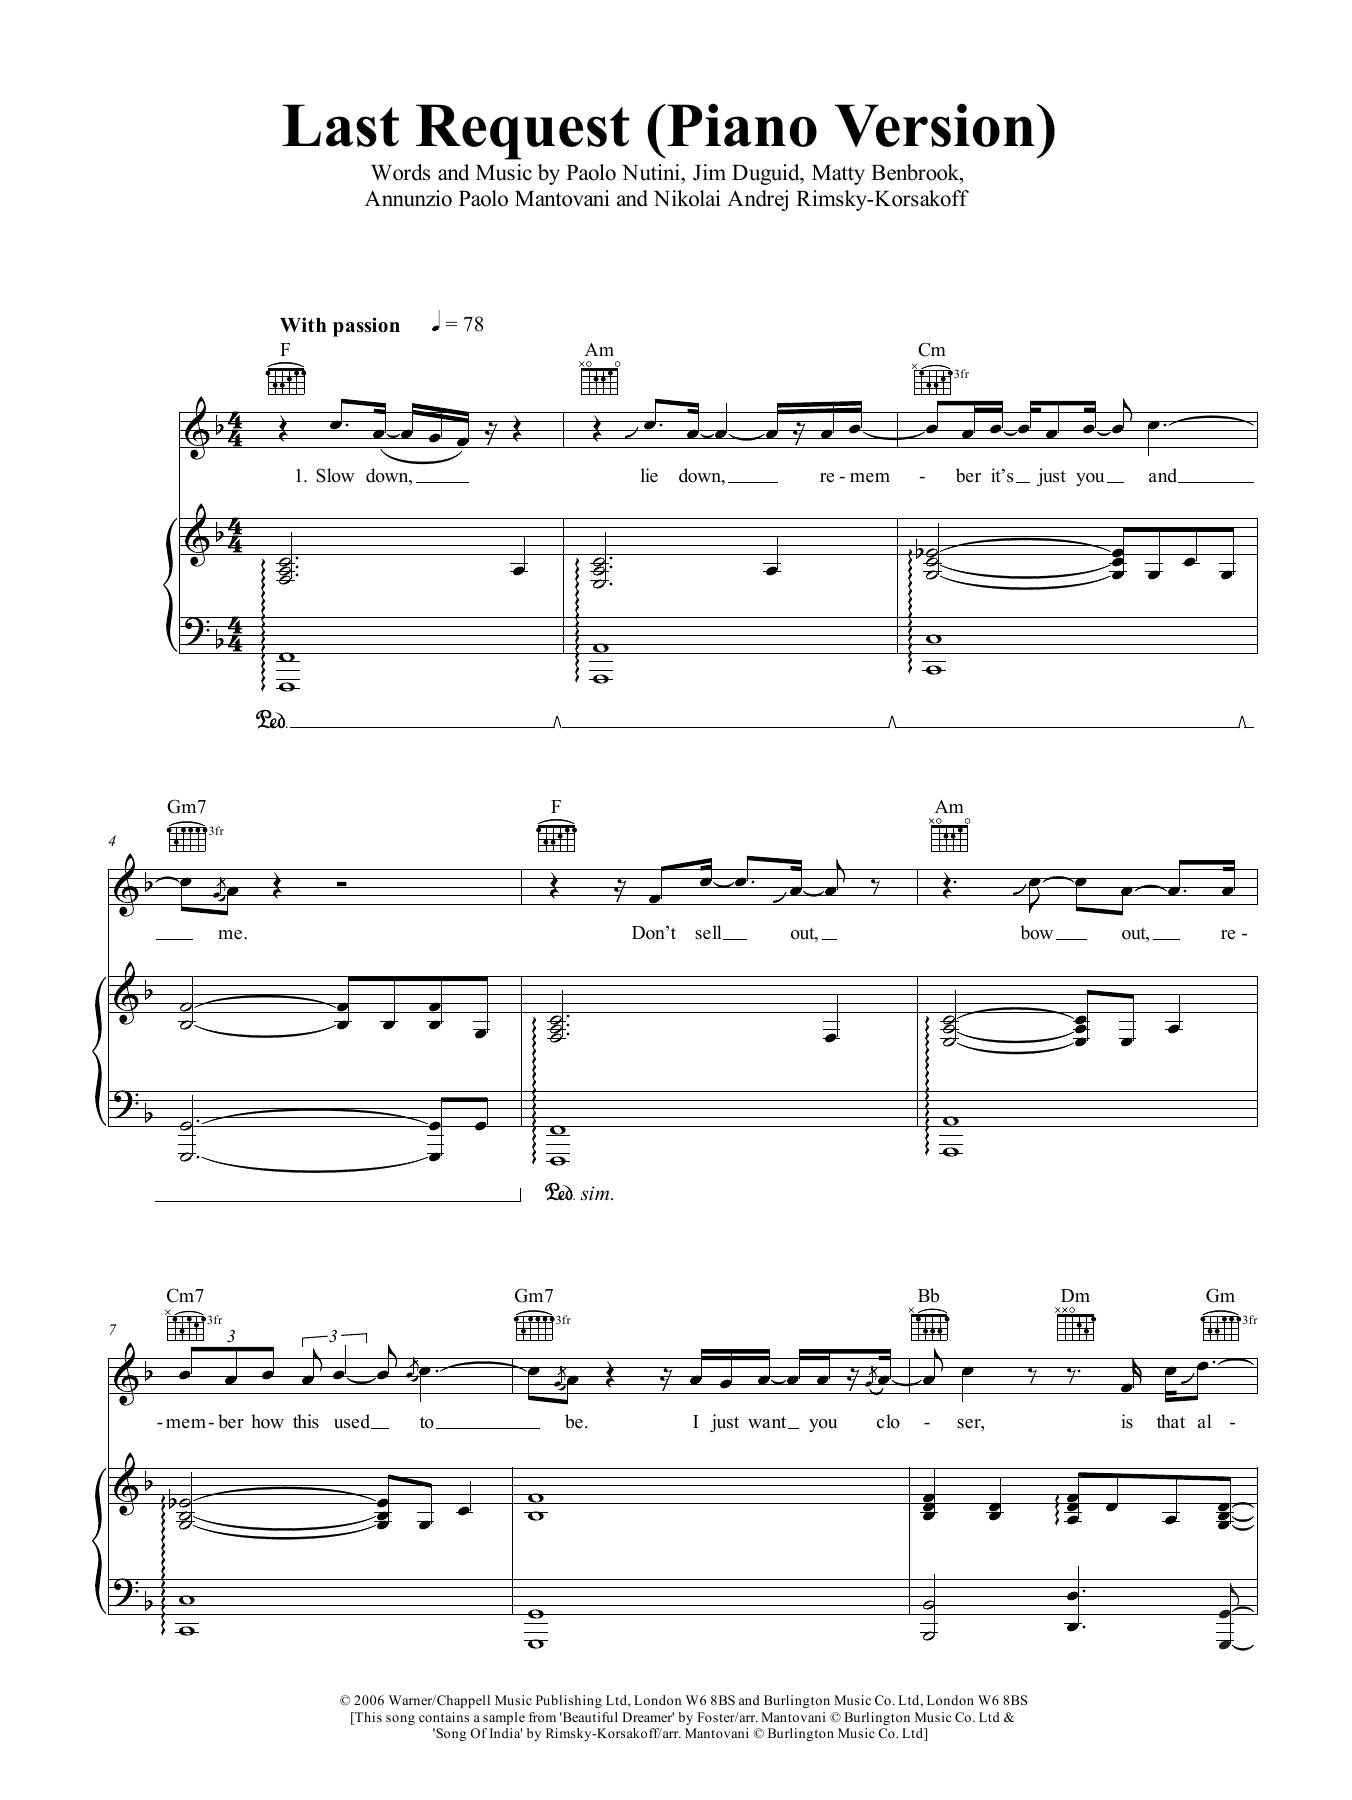 Last Request (piano version) Sheet Music